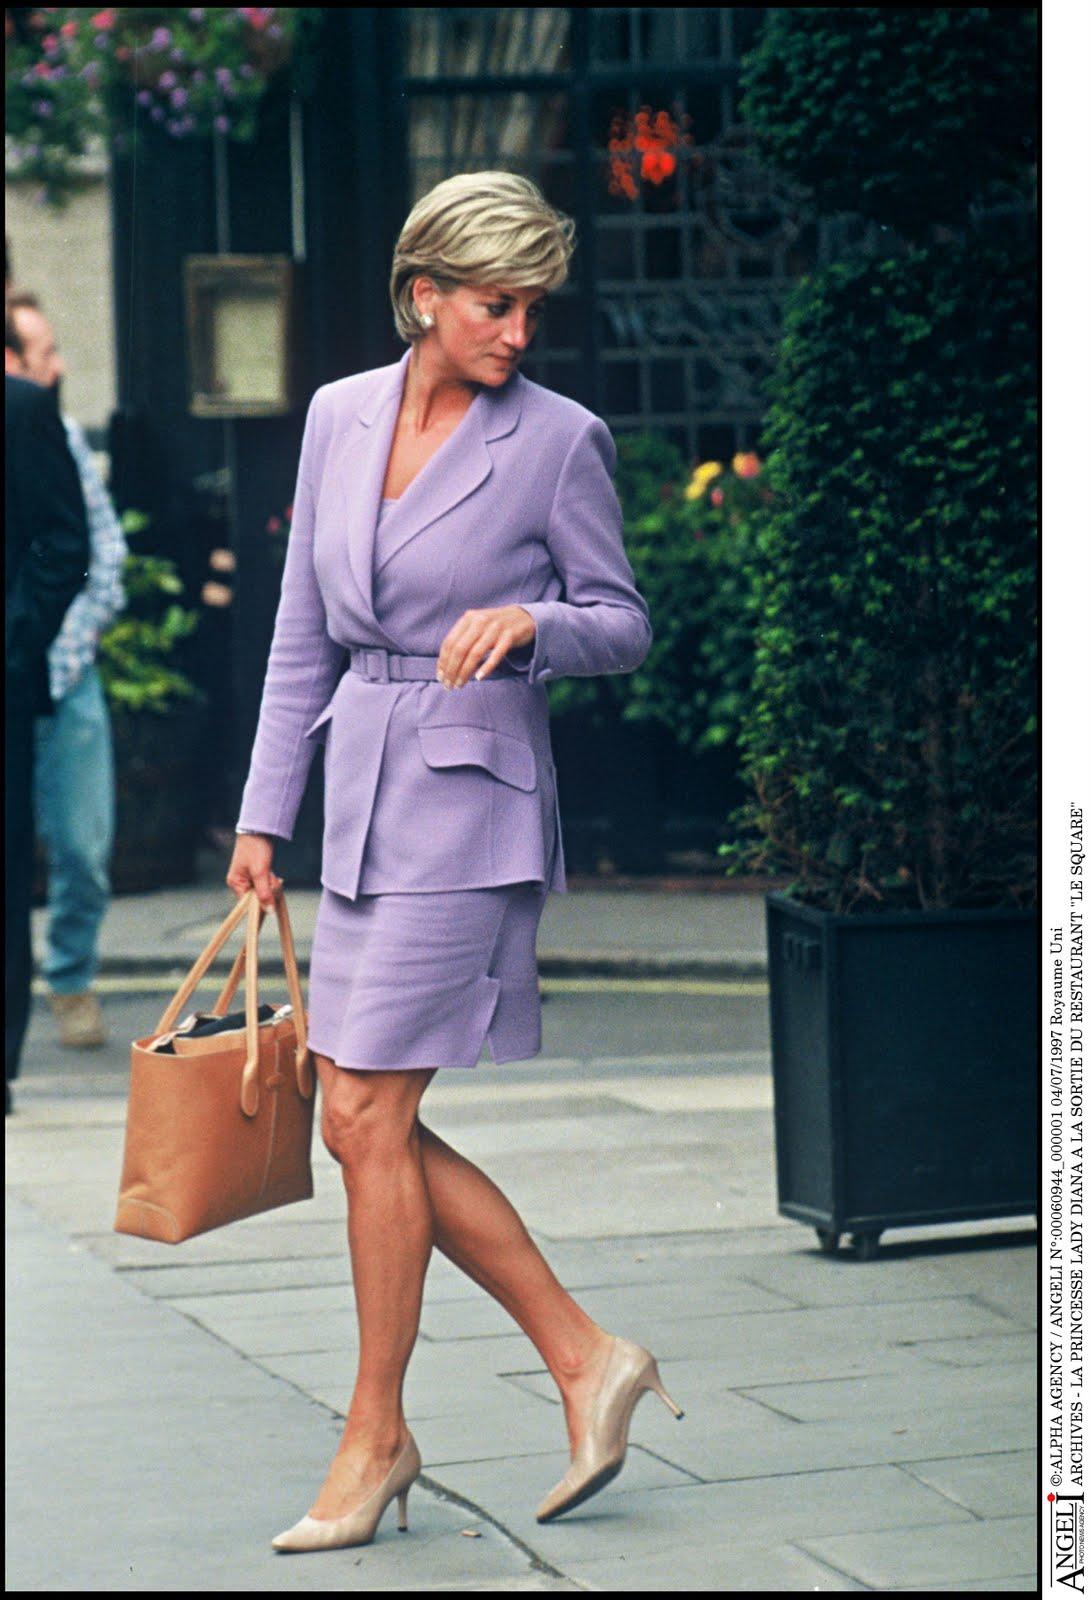 http://3.bp.blogspot.com/-gwDngUMCxDk/TbocQZB47DI/AAAAAAAABAA/YsoWPFZicBA/s1600/Lady+Diana+with+the+D+Bag+2.jpg